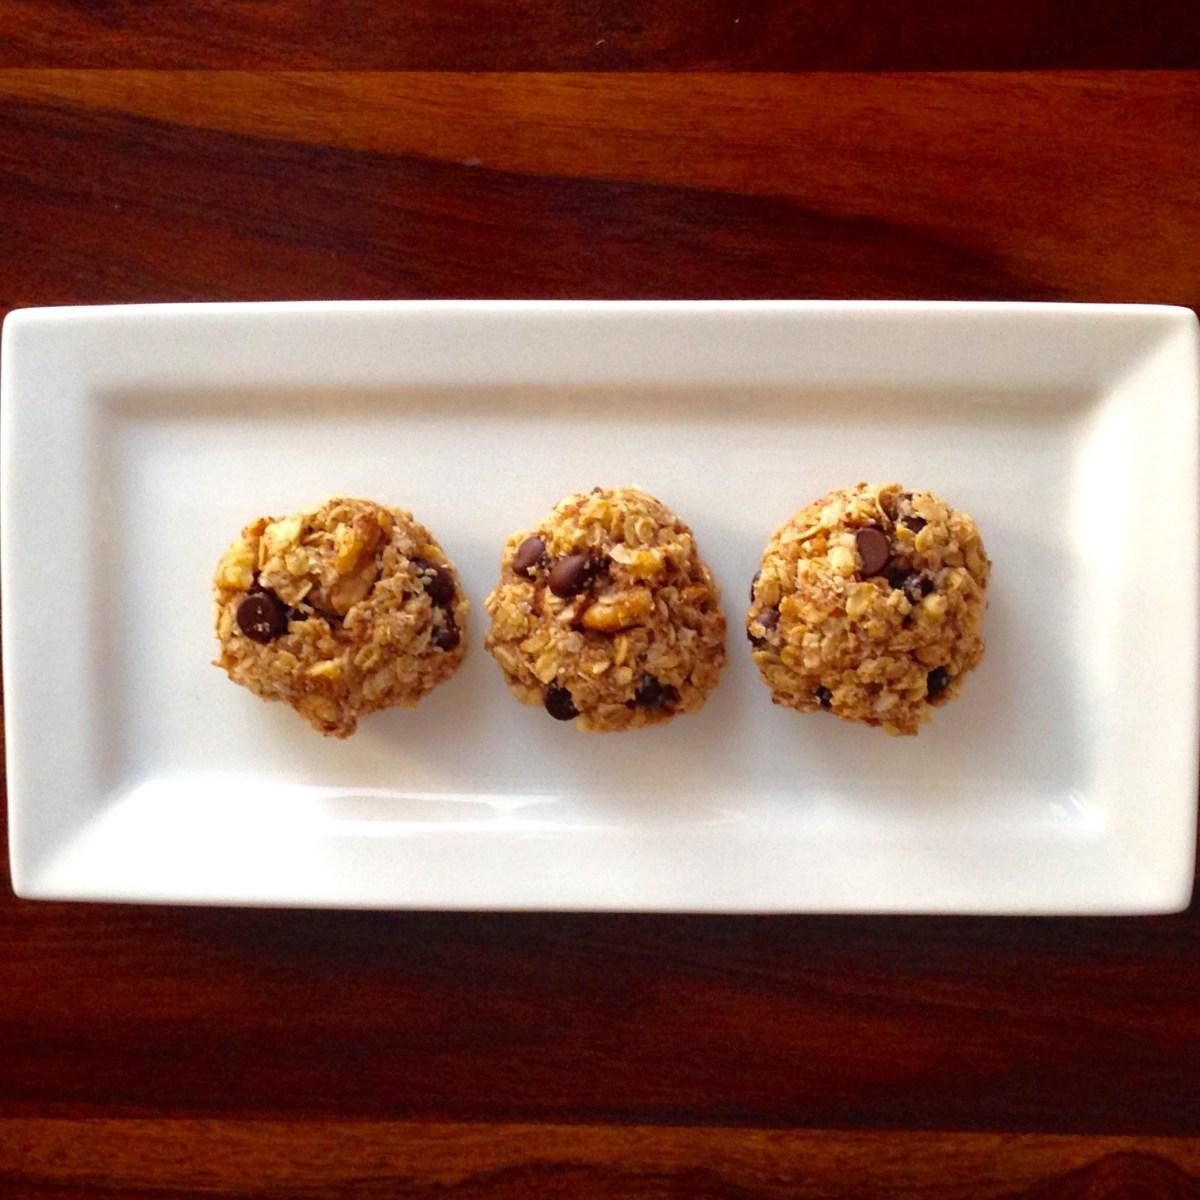 Breakfast Cookies from Bread & Wine by Shauna Niequist